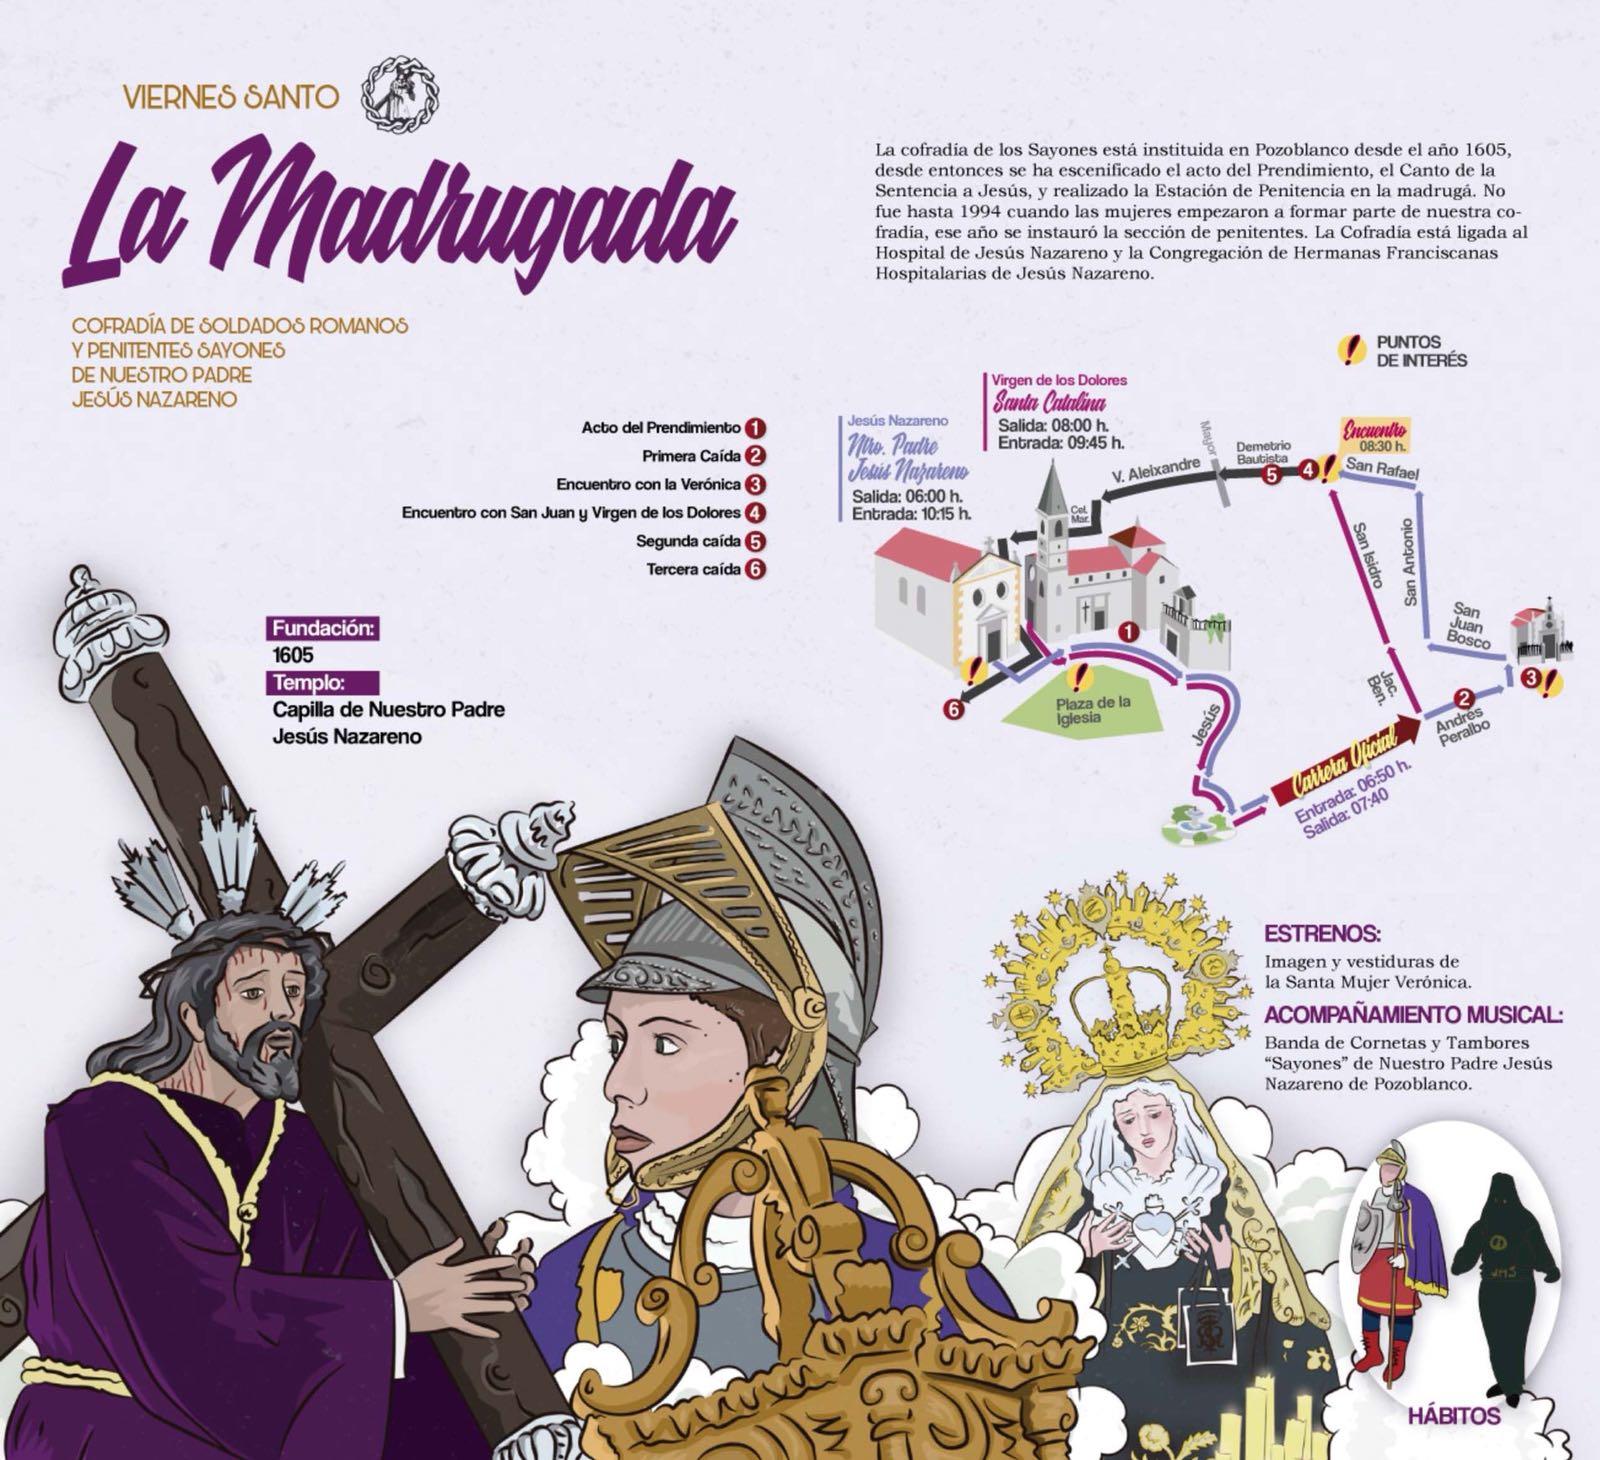 Viernes Santo - La Madrugada